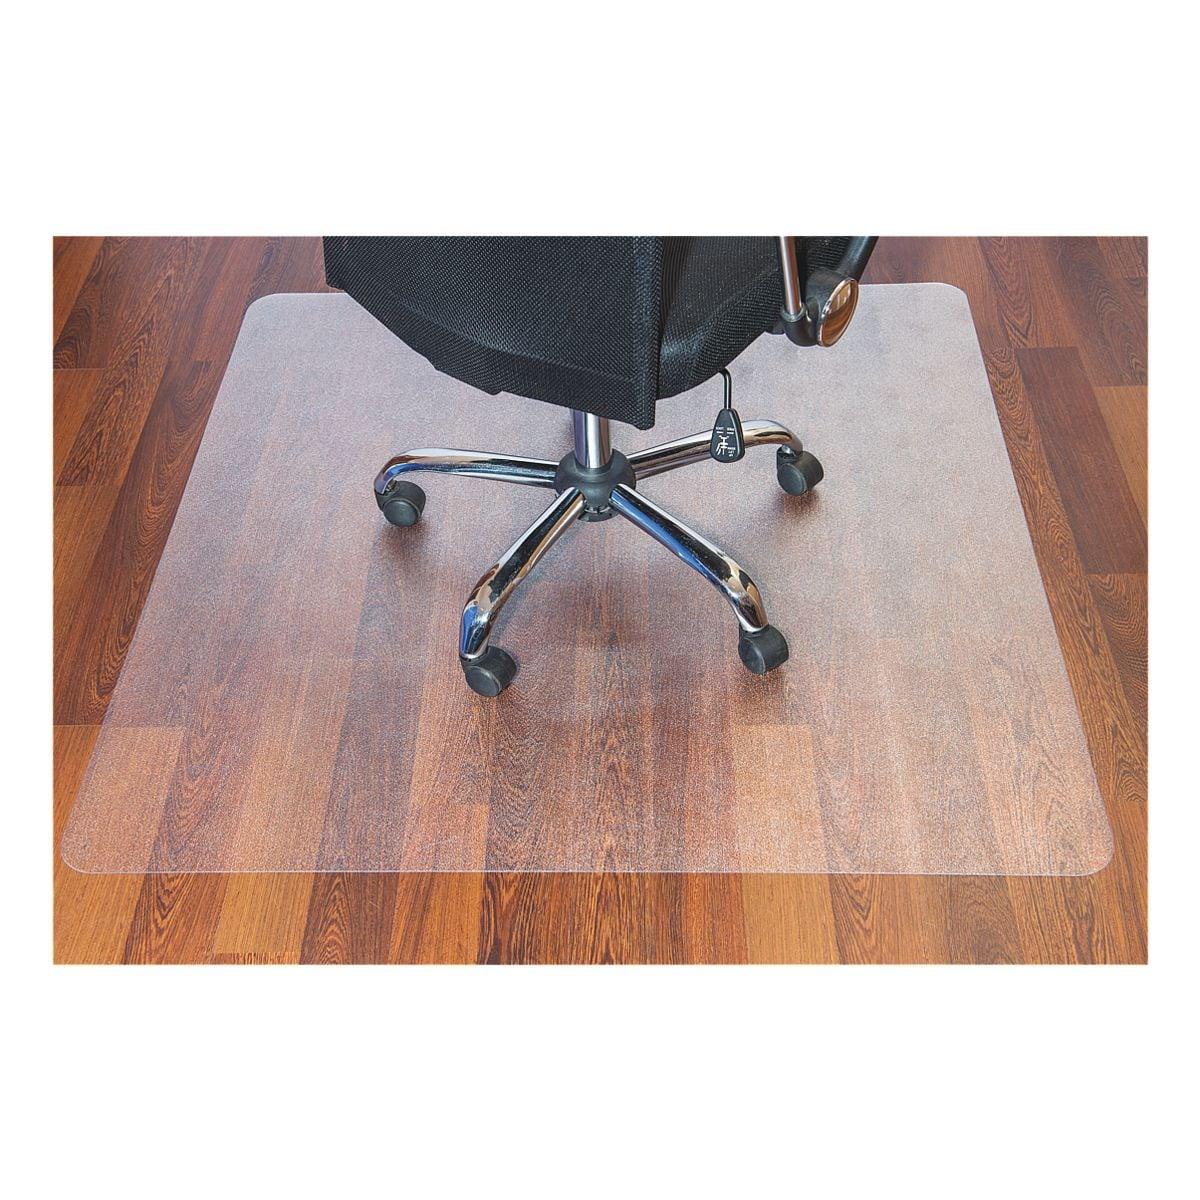 bodenschutzmatte f r hartb den polycarbonat rechteck 75 x 120 cm otto office budget bei otto. Black Bedroom Furniture Sets. Home Design Ideas